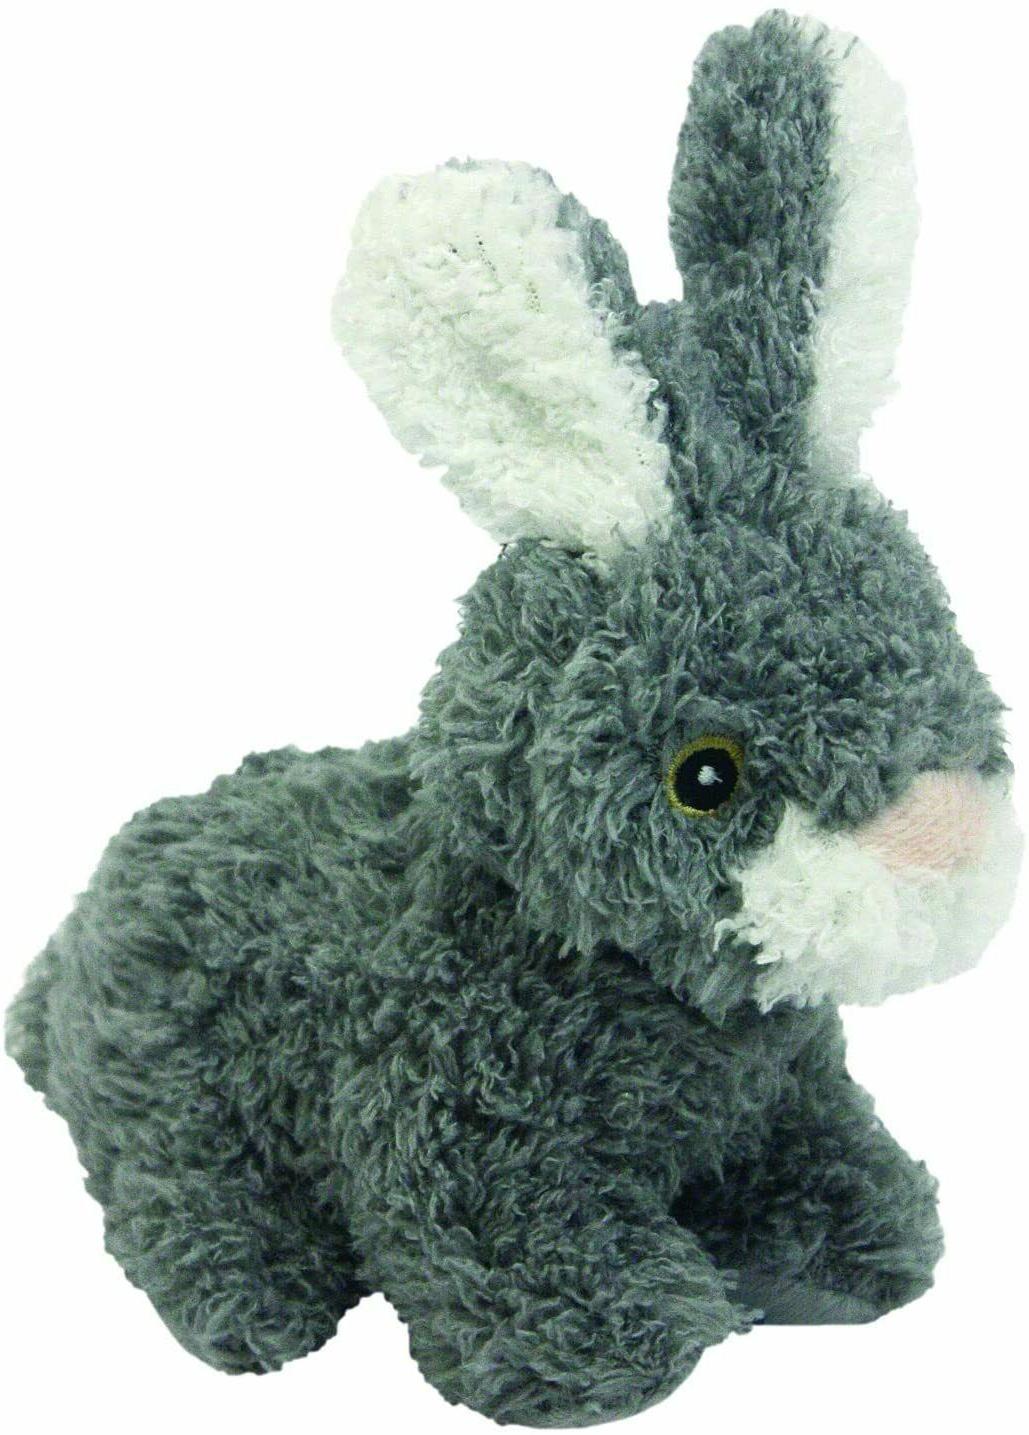 mp27155 look whos talking rabbit